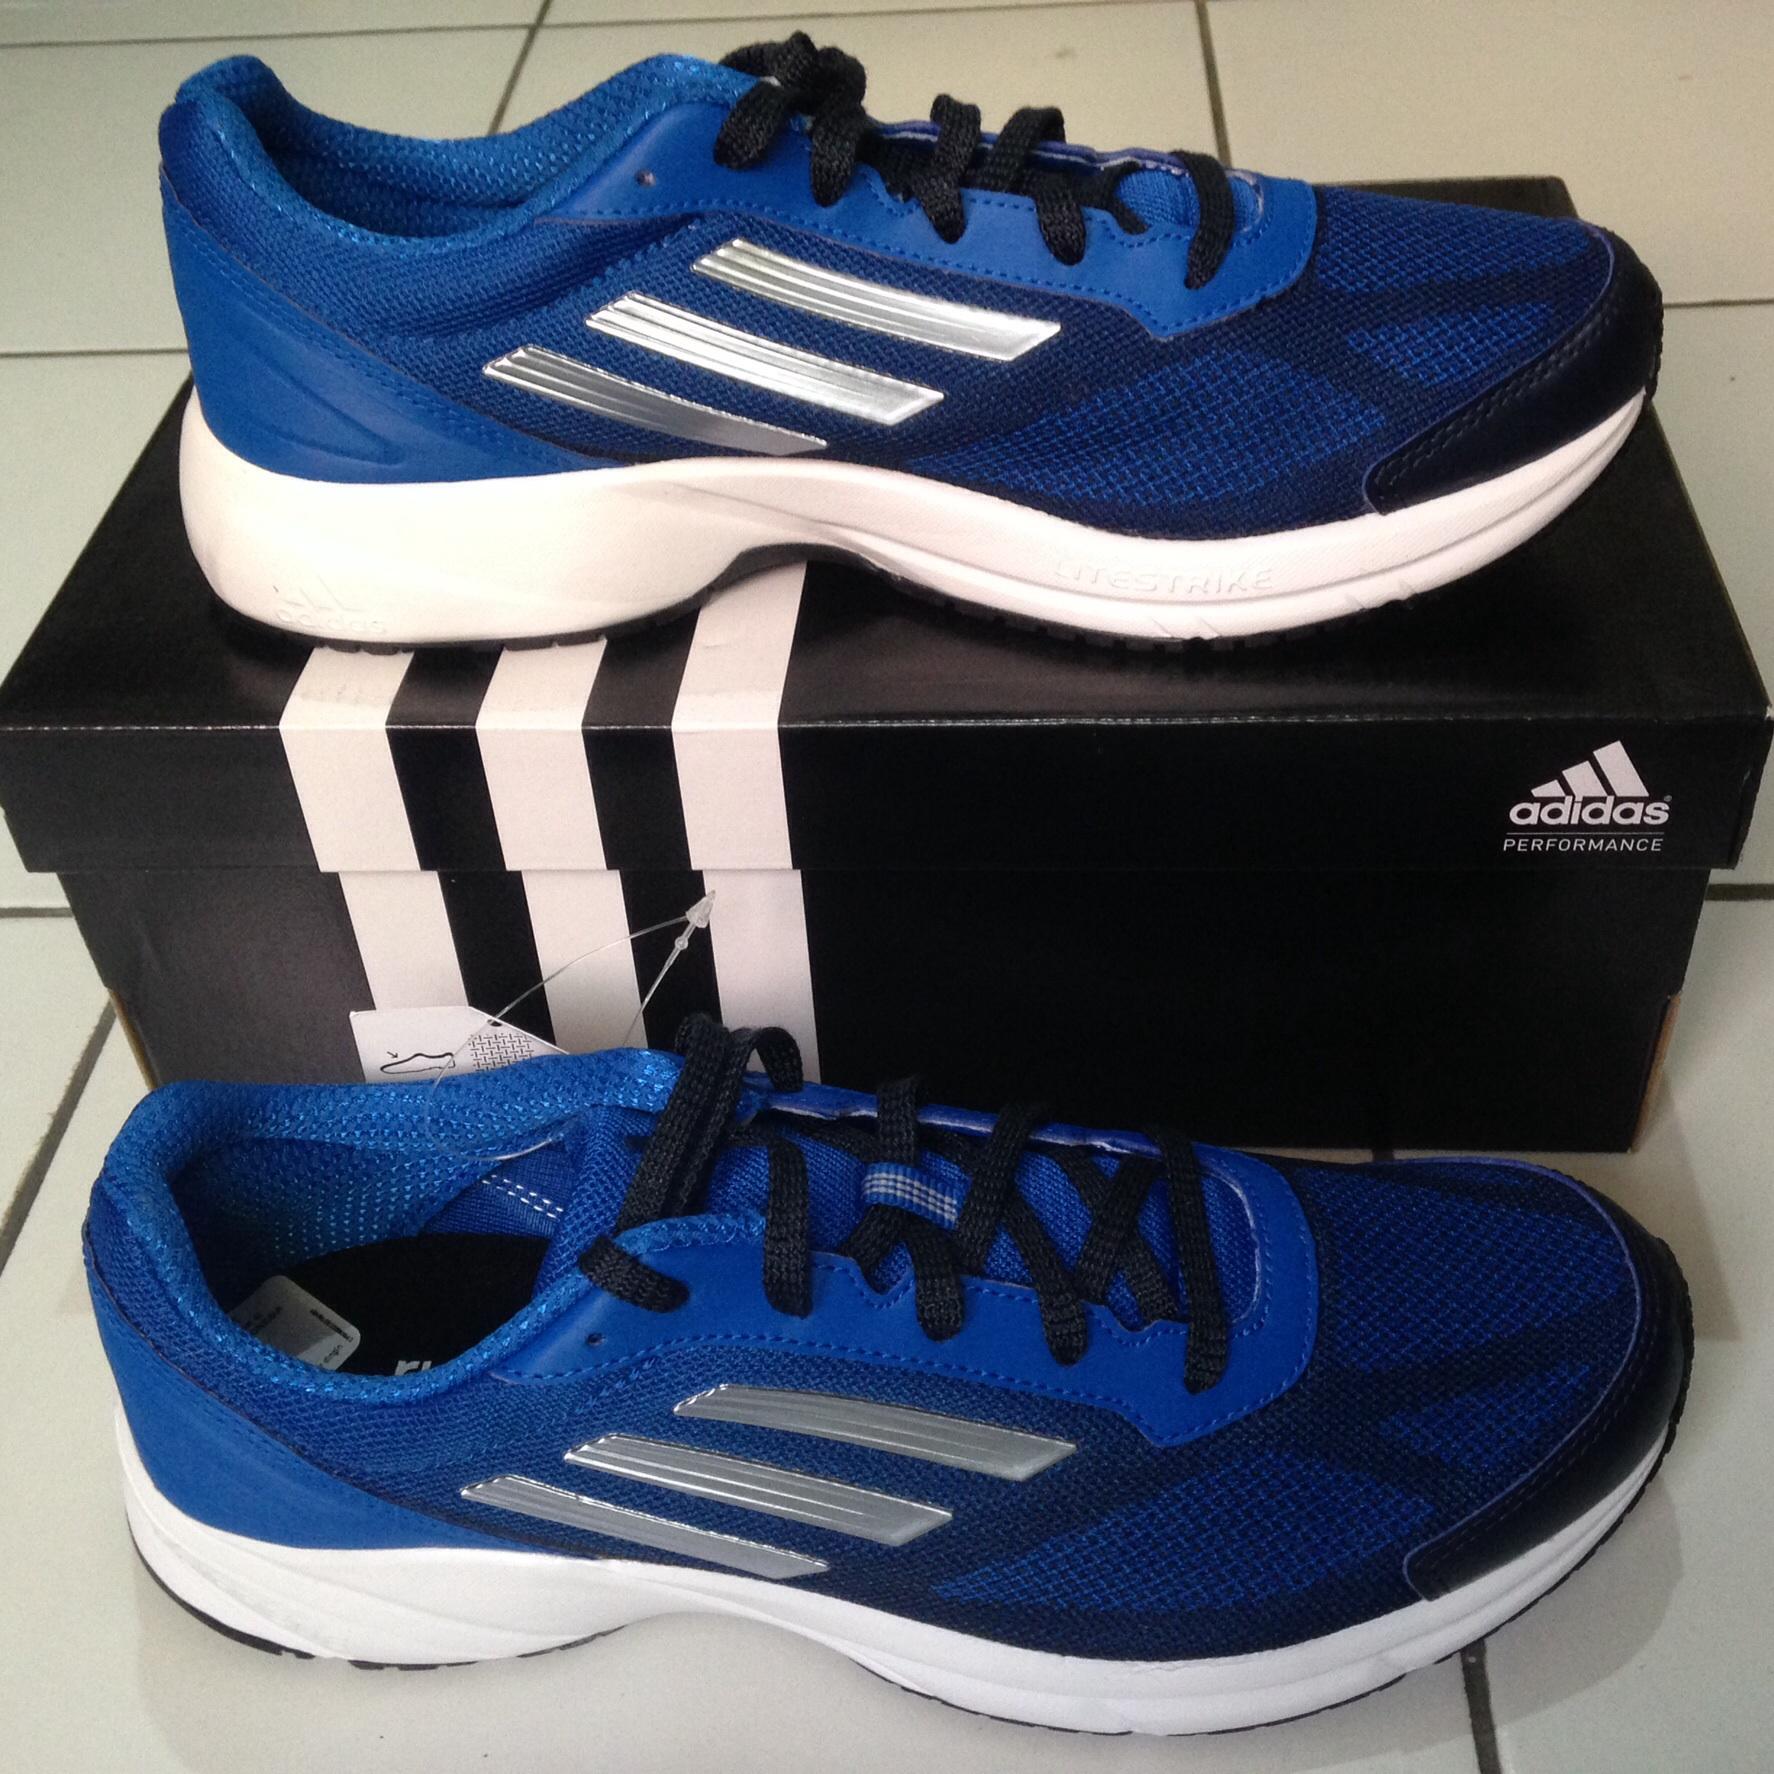 Sepatu Adidas Superstar 2 Lite M Jual Pacer M18053 Running Original Nurhadi Sport Store Tokopedia